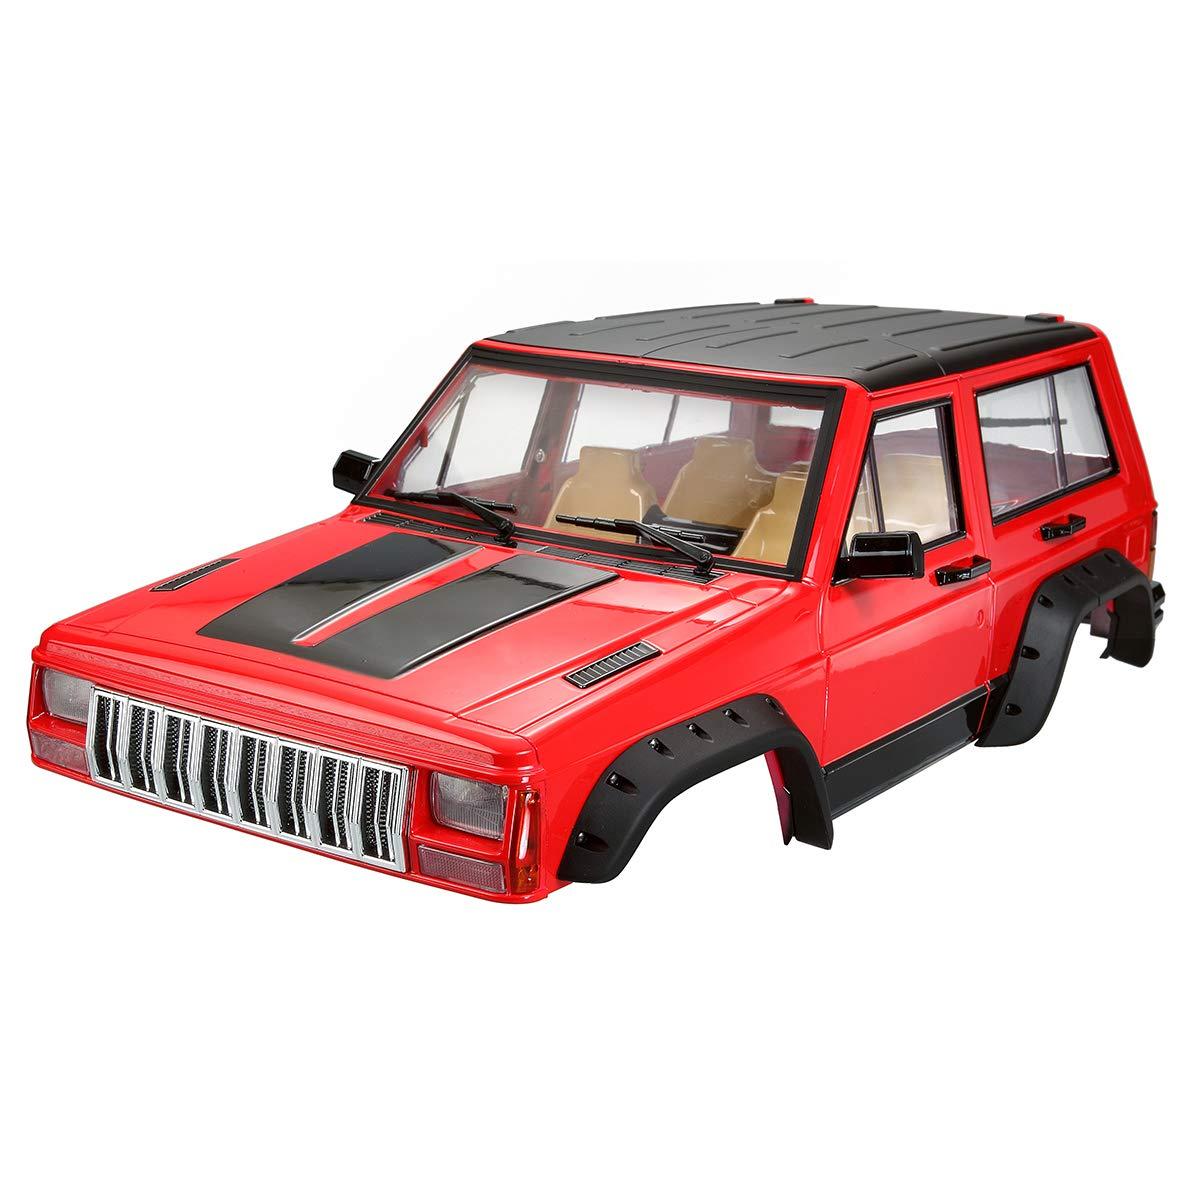 PinShang 313 mm Radstand Autokarosserie-Set Zubehör für Axial SCX10 RC4WD D90 RC Car 1 10 Rock Crawler Teile rot Rot